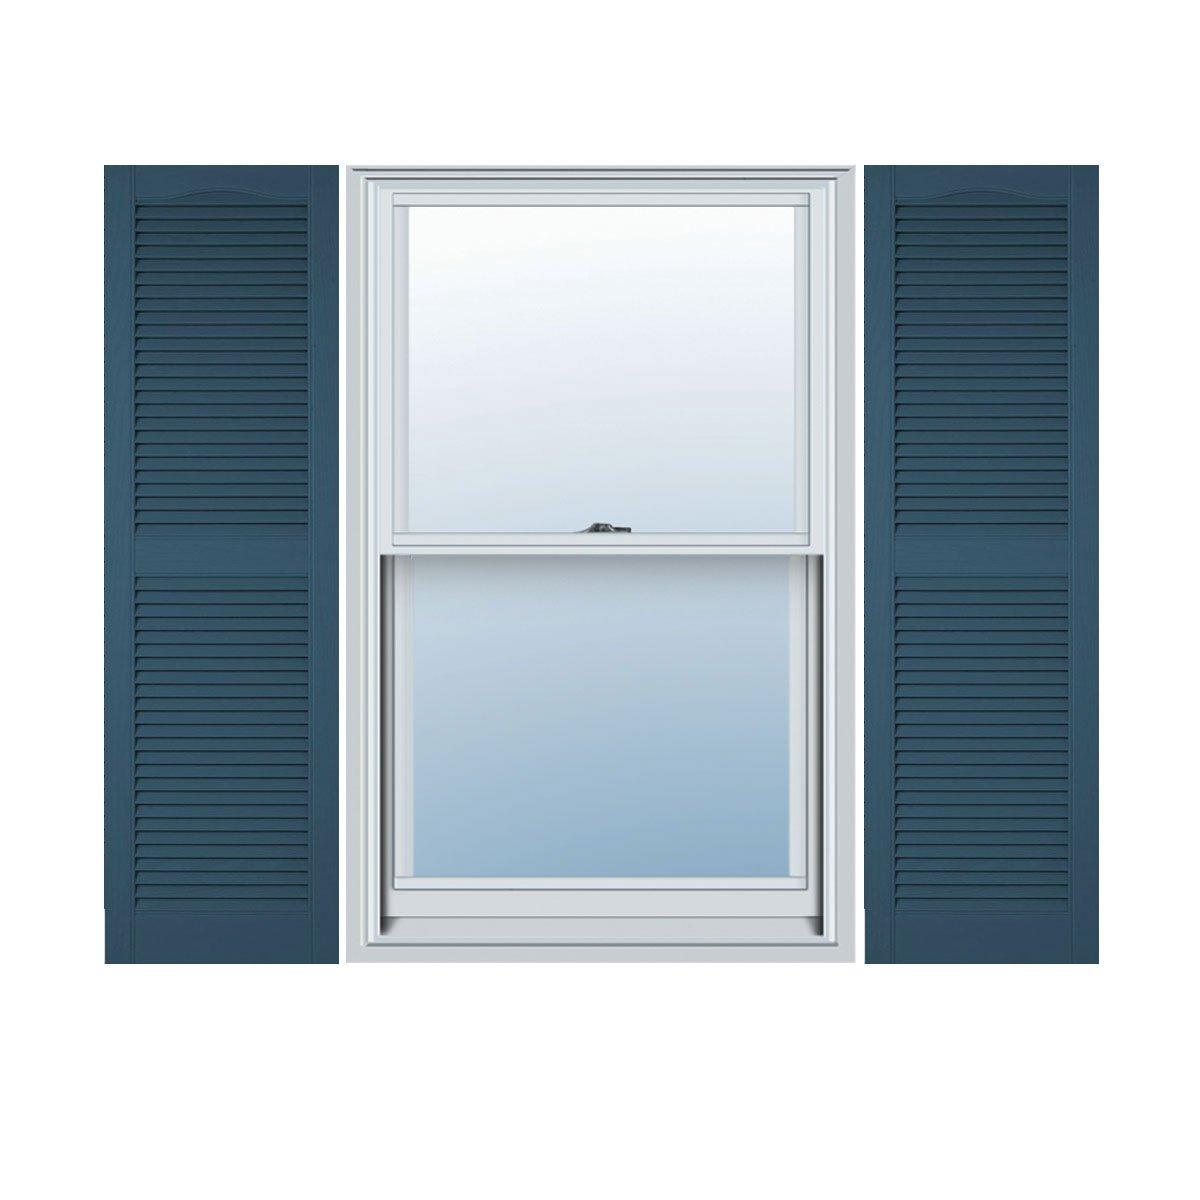 14.5W x 80H Builders Edge  Shutters 036 Per Pair Classic Blue